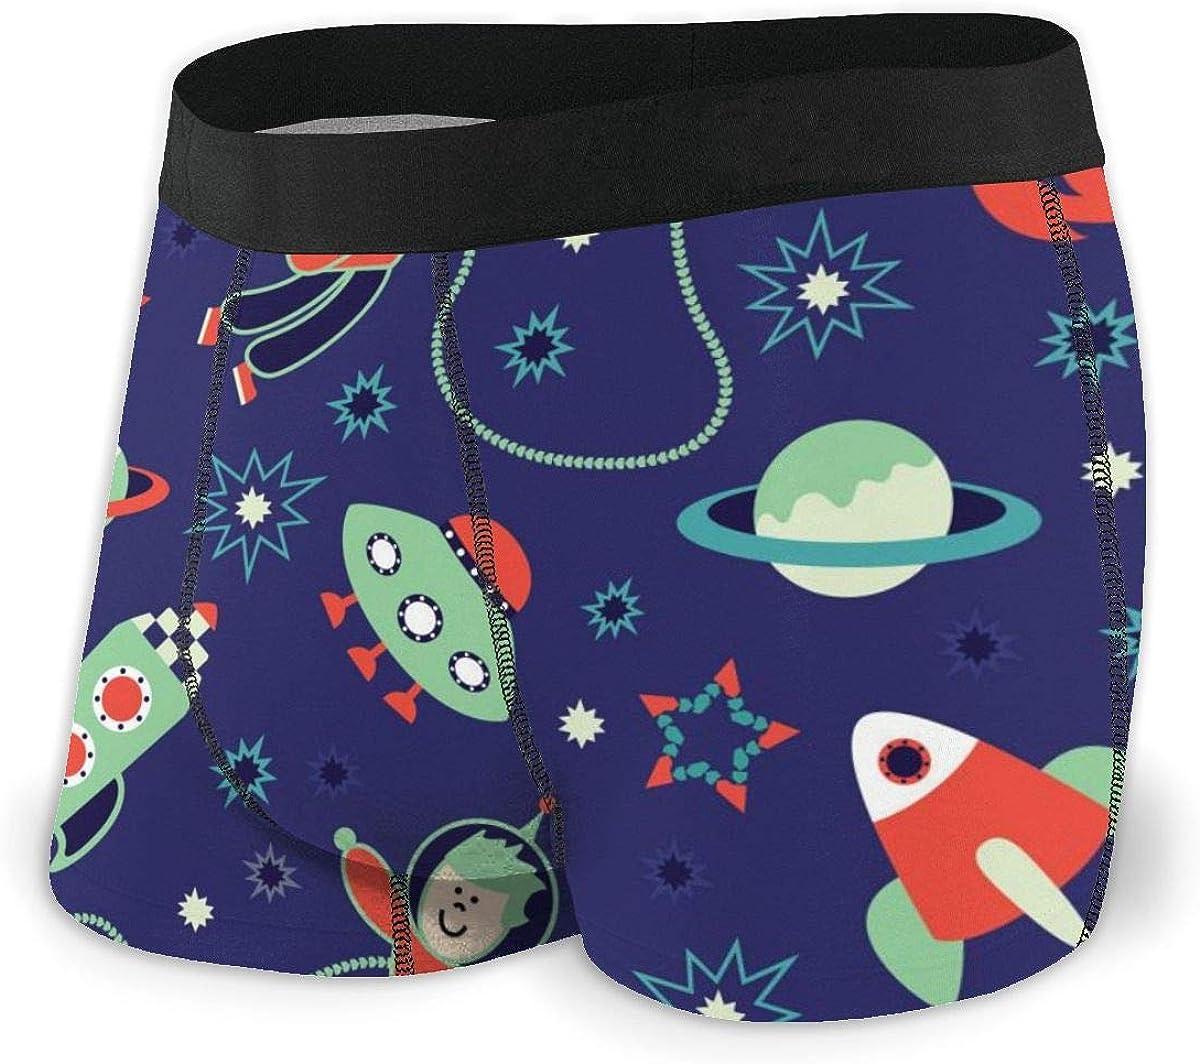 Randolph Wordsworth Mens Boxer Briefs Spaceships and Astronauts Nave Blue Breathable Underwear